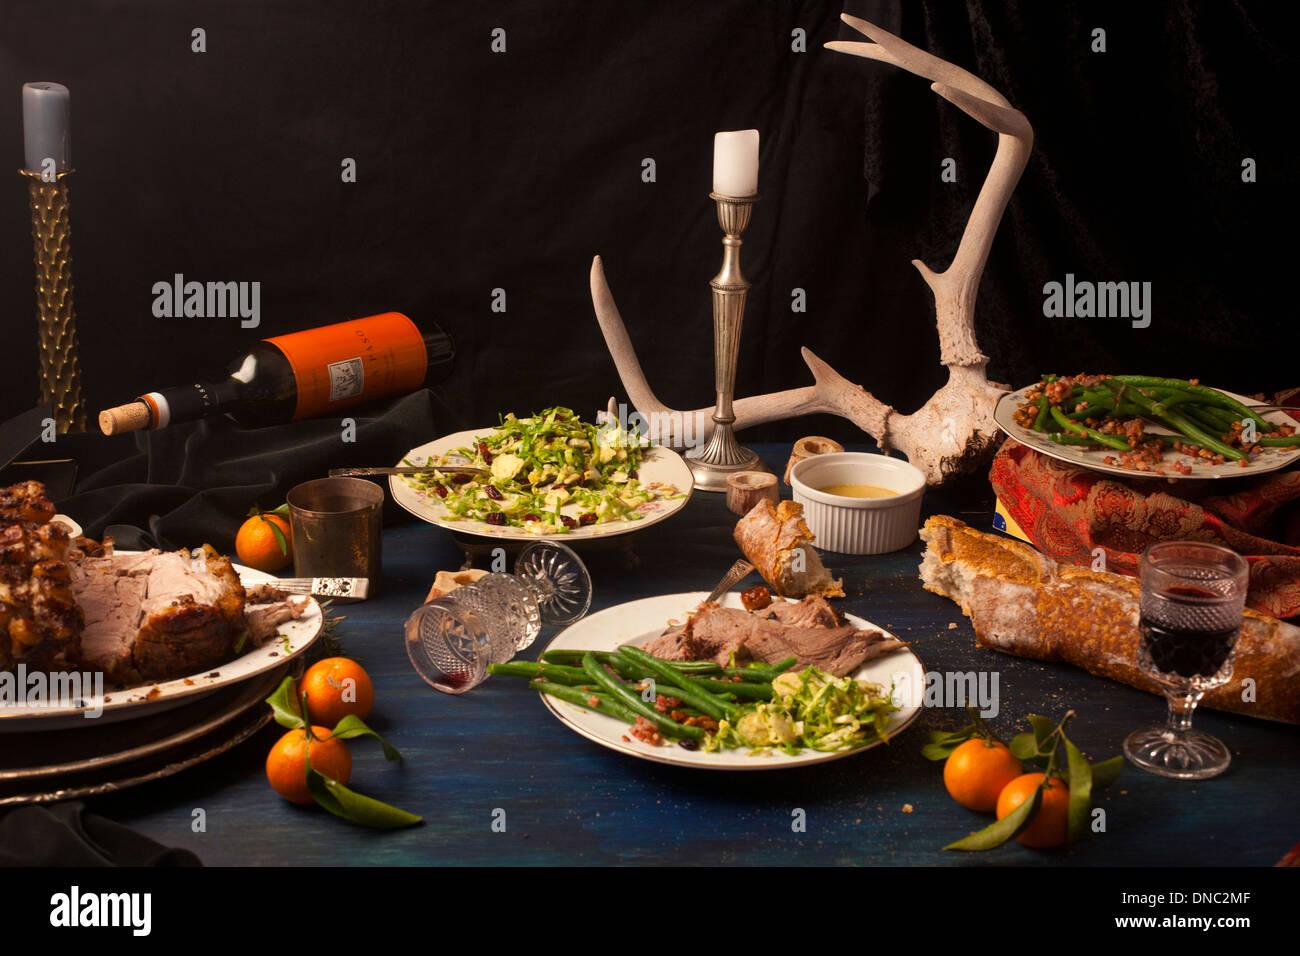 Rôti de porc après dîner mathématiques still life Photo Stock